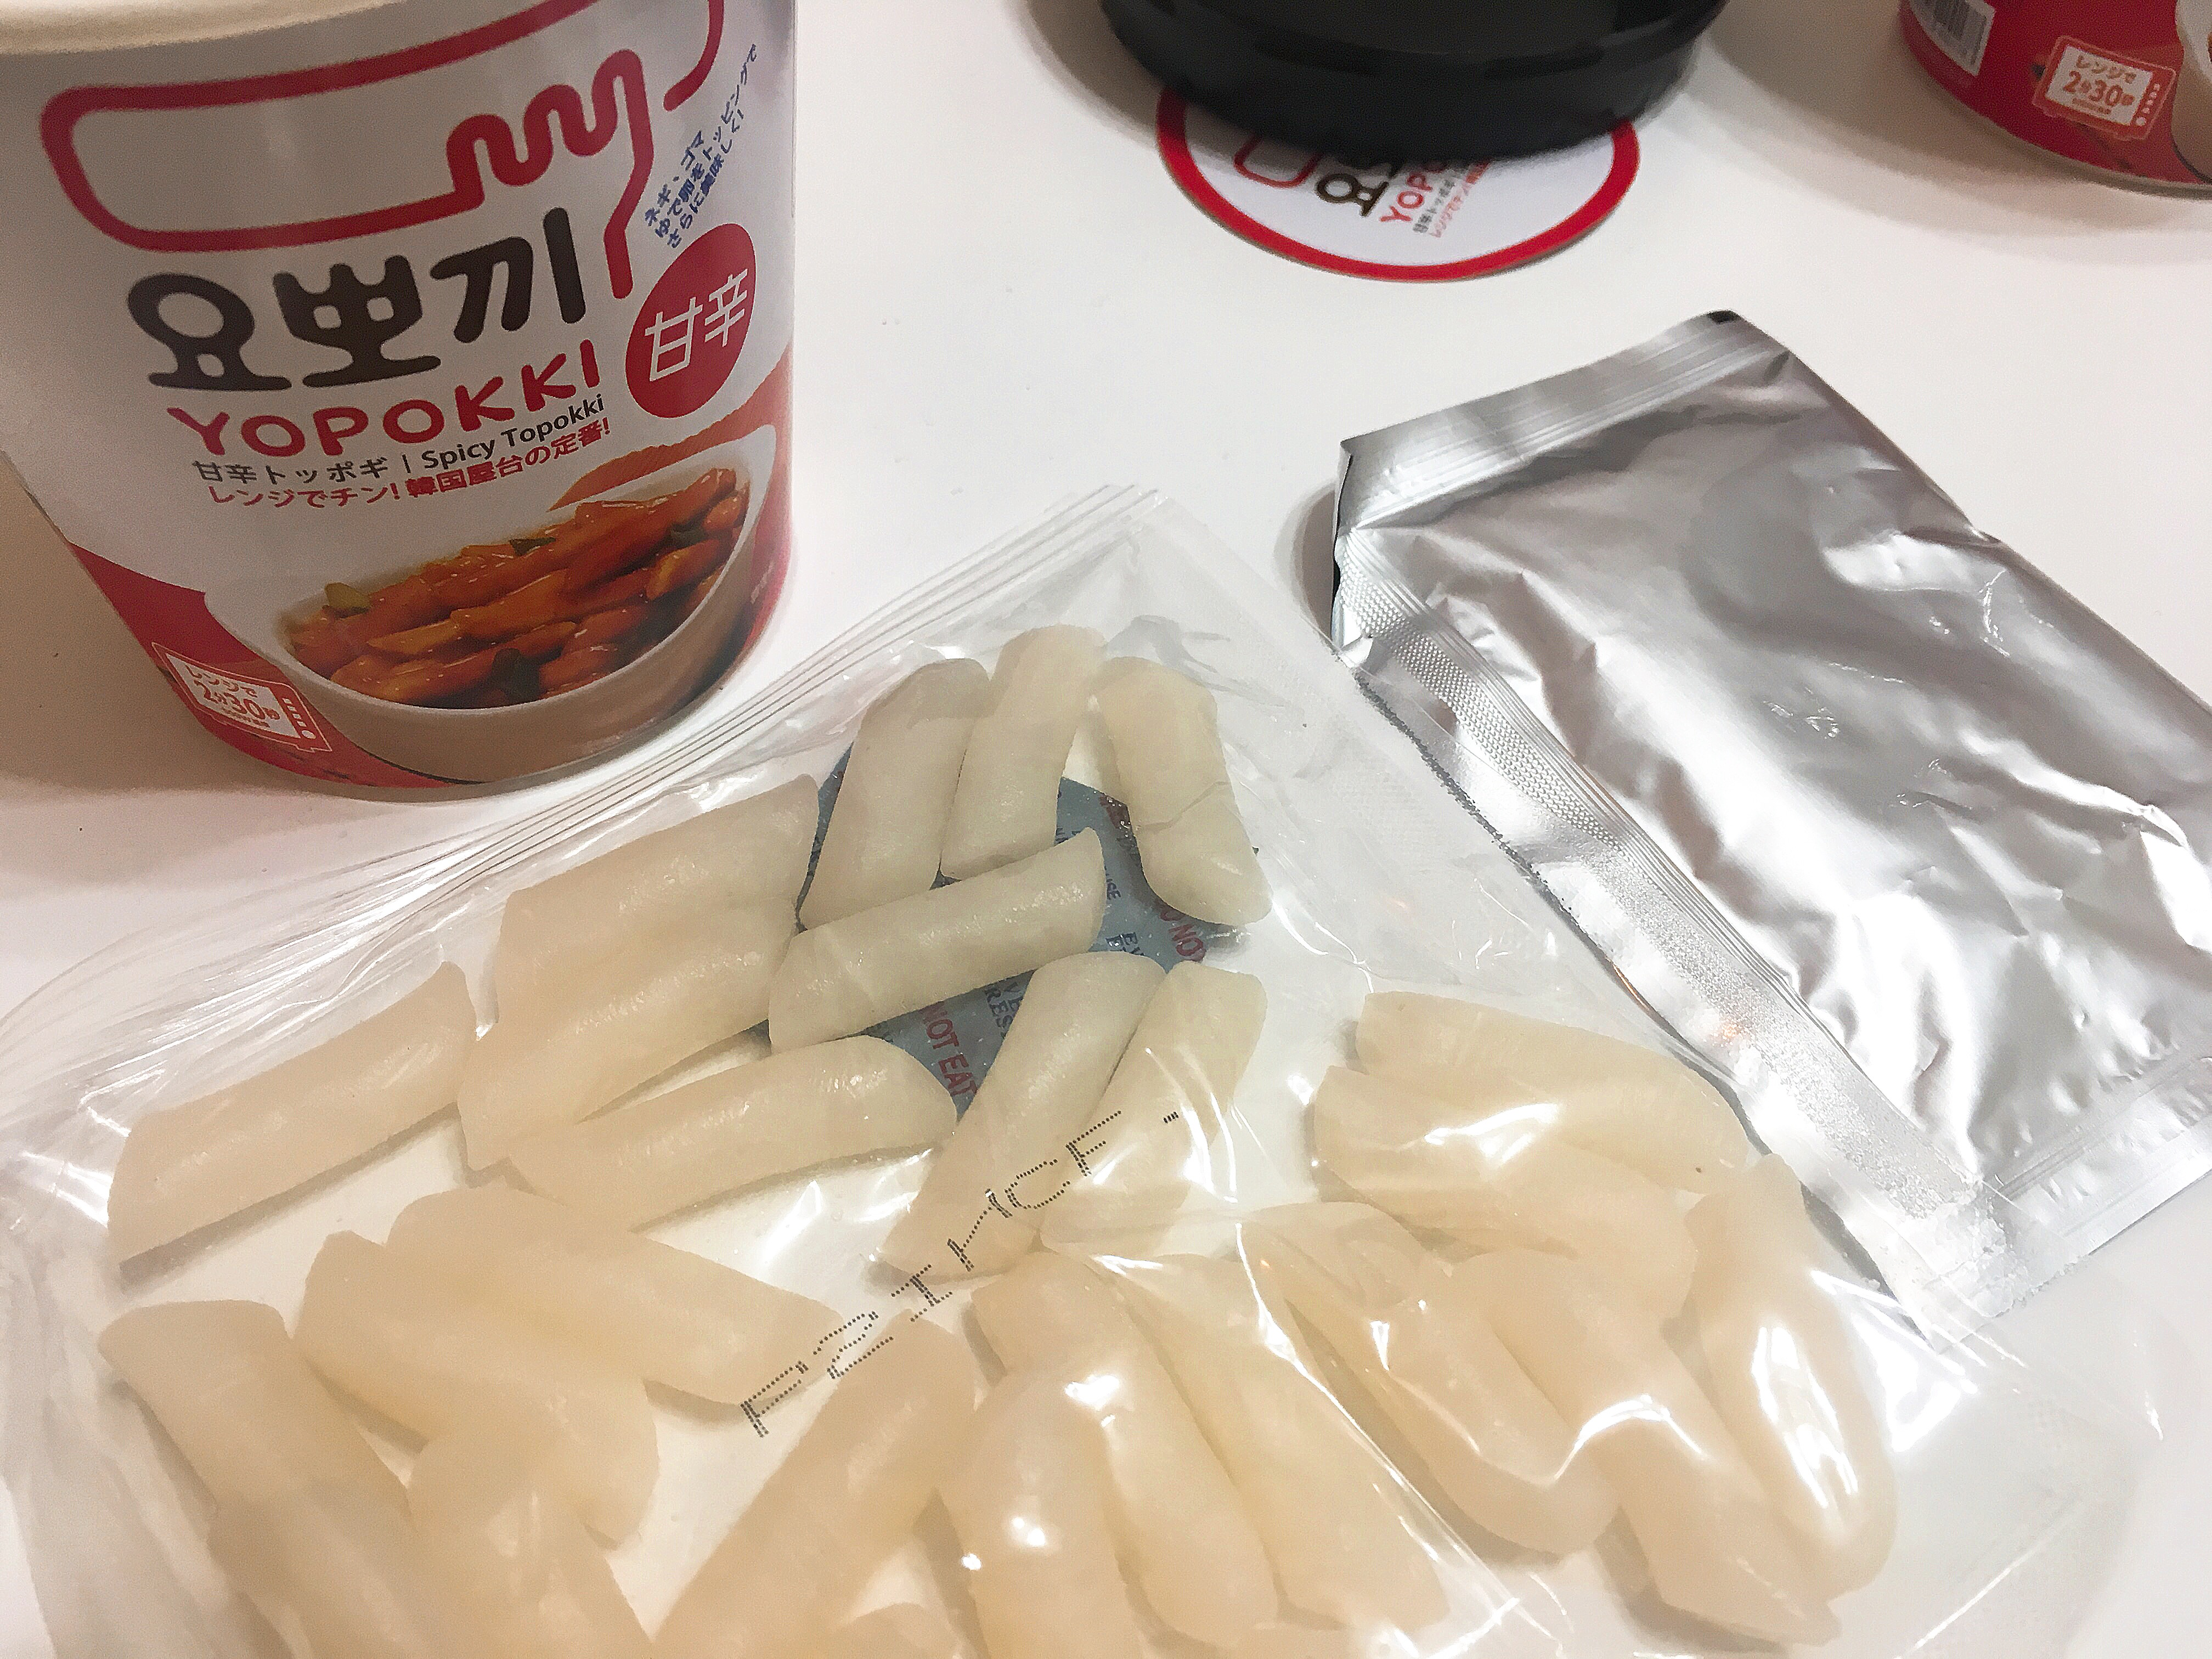 YOPOKKI ヨッポギの甘辛味の作り方の画像